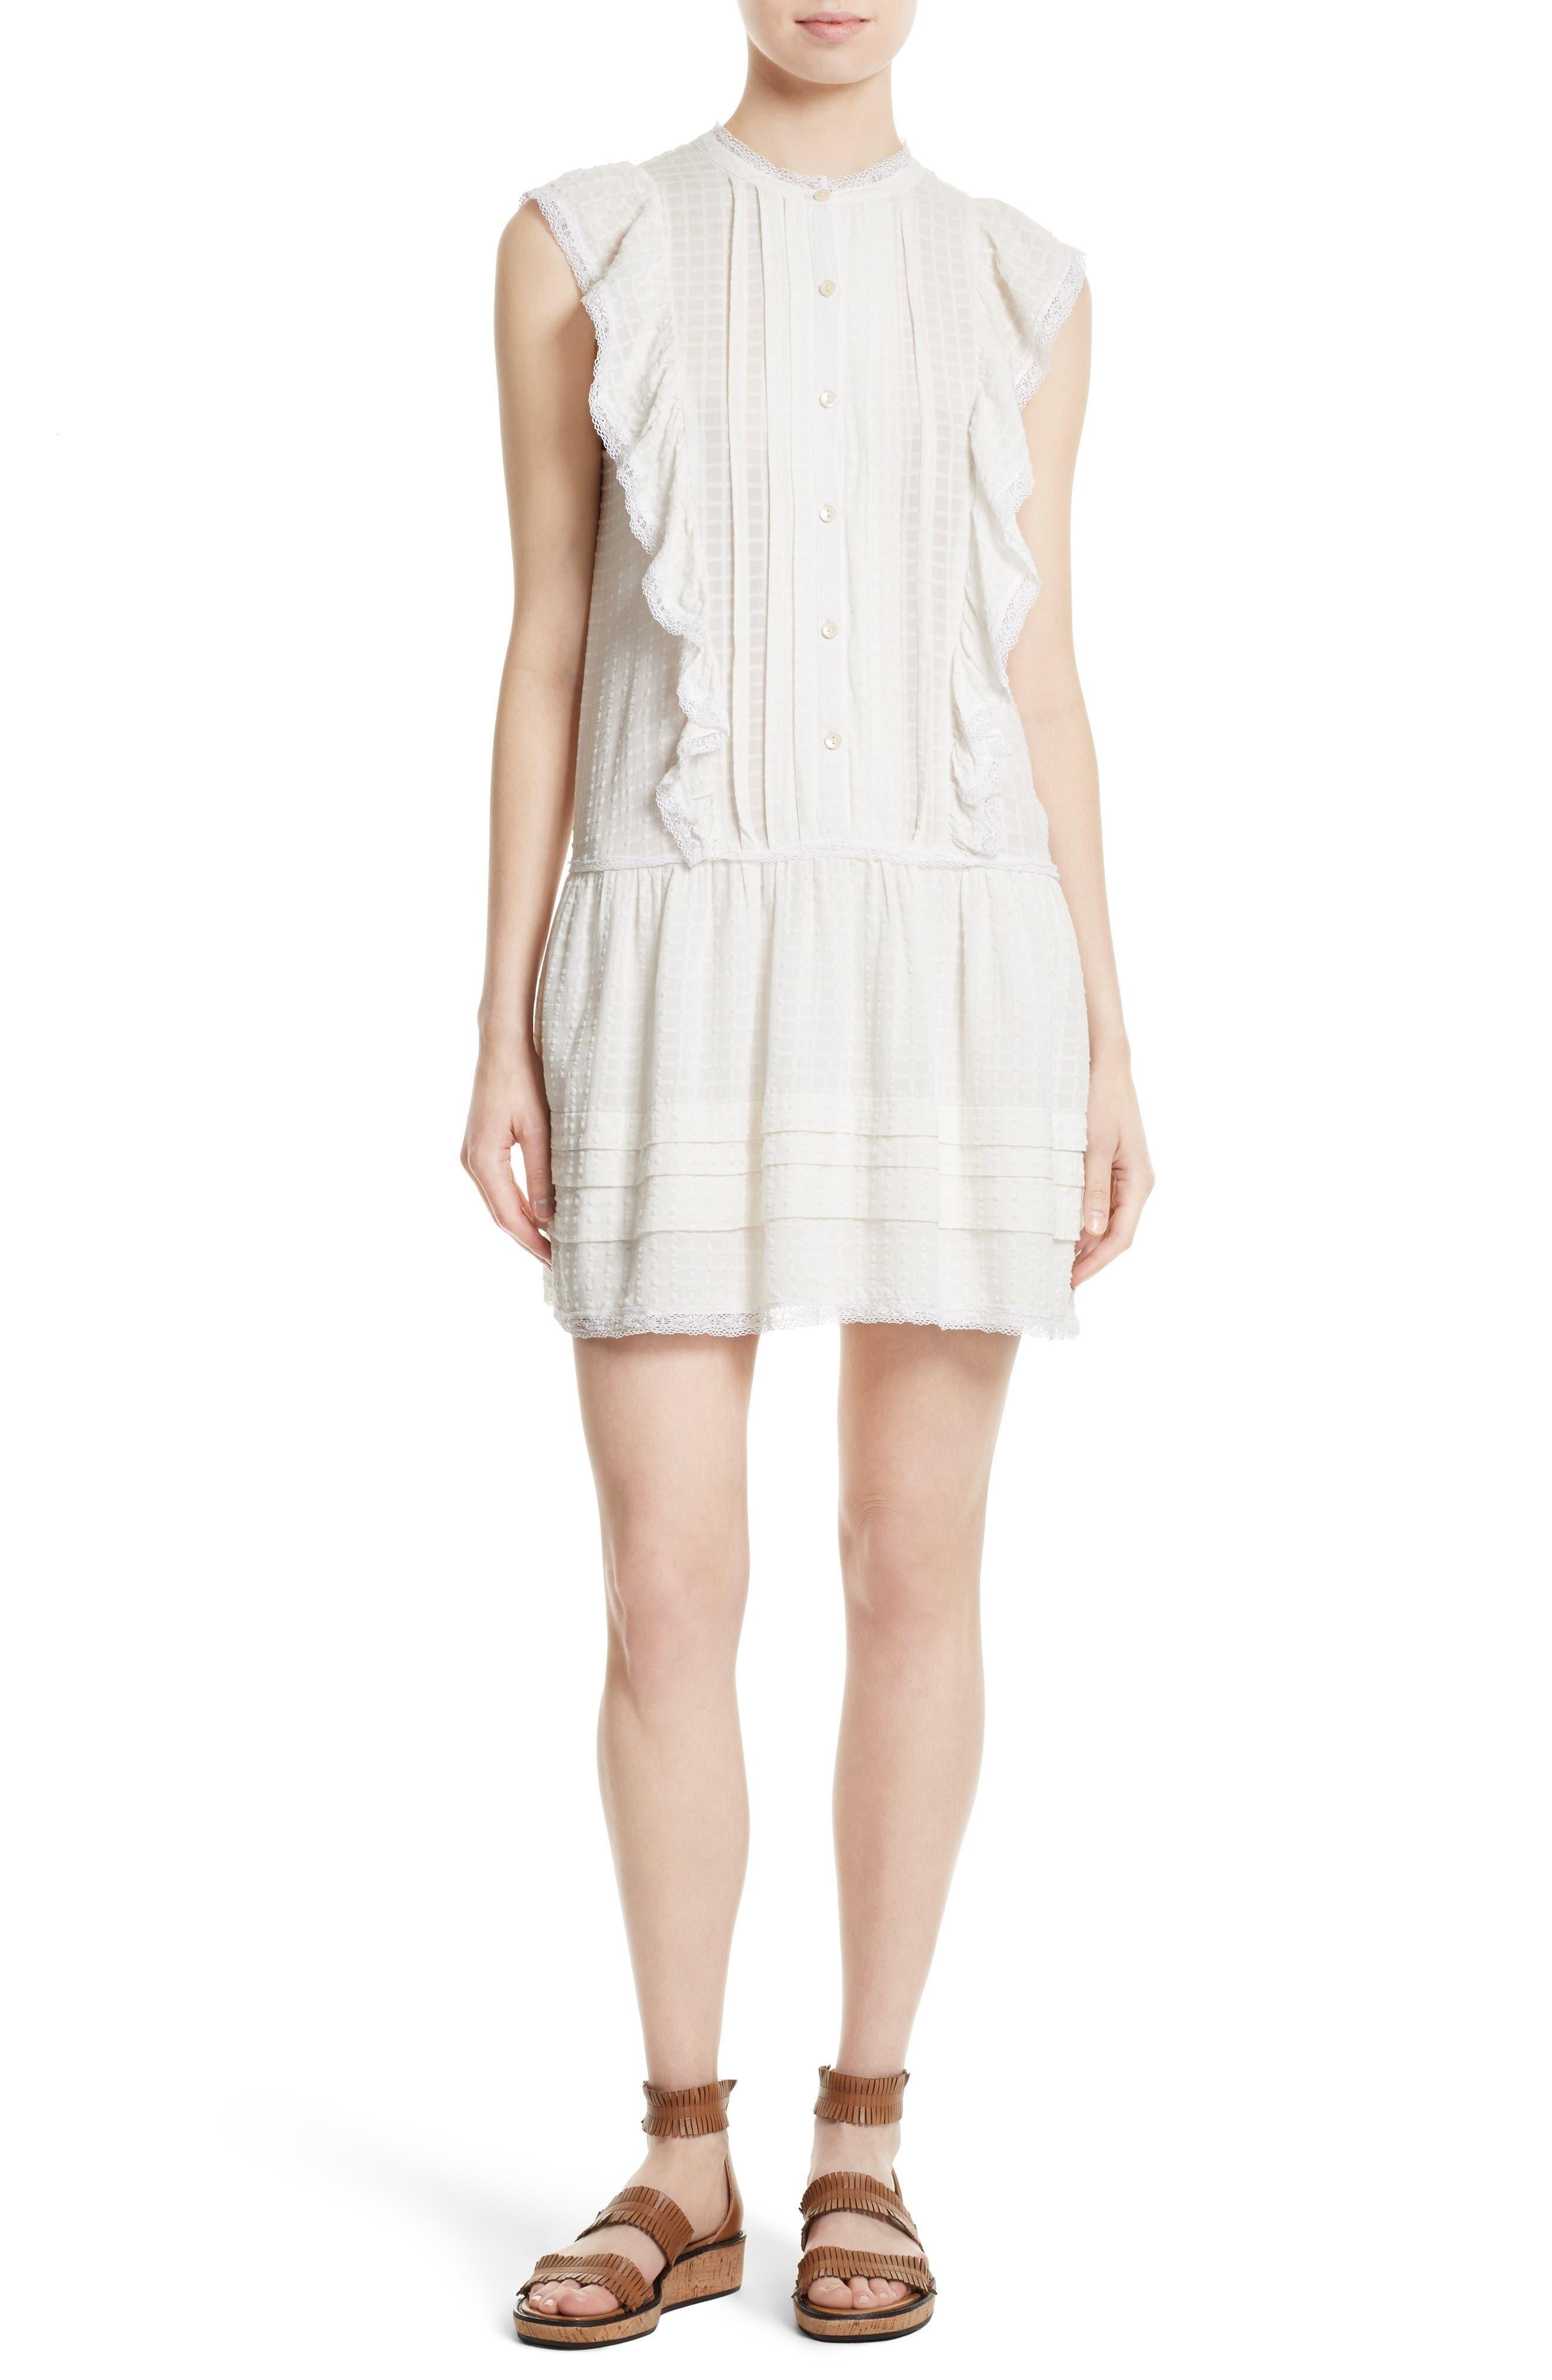 Alternate Image 1 Selected - La Vie Rebecca Taylor Draped Ruffle Dress